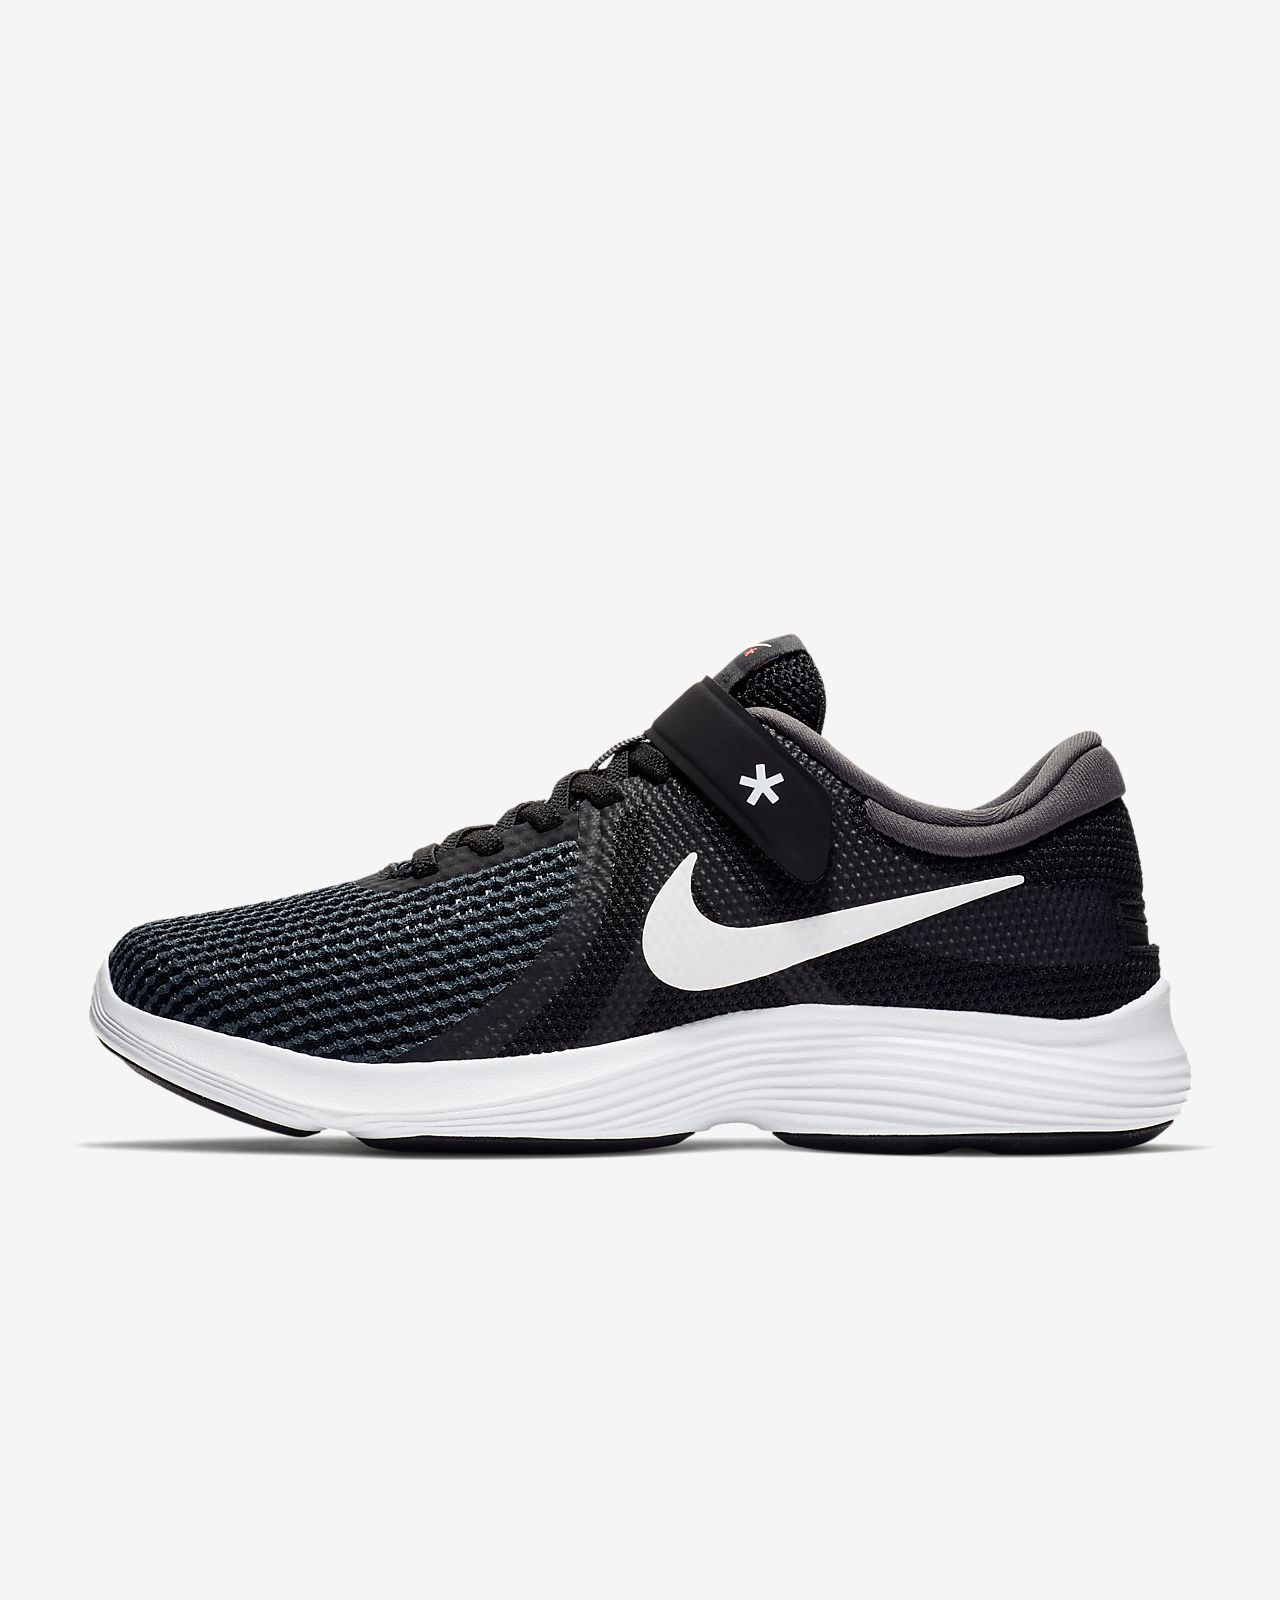 3daa26222c3c Nike Revolution 4 FlyEase Women s Running Shoe. Nike.com